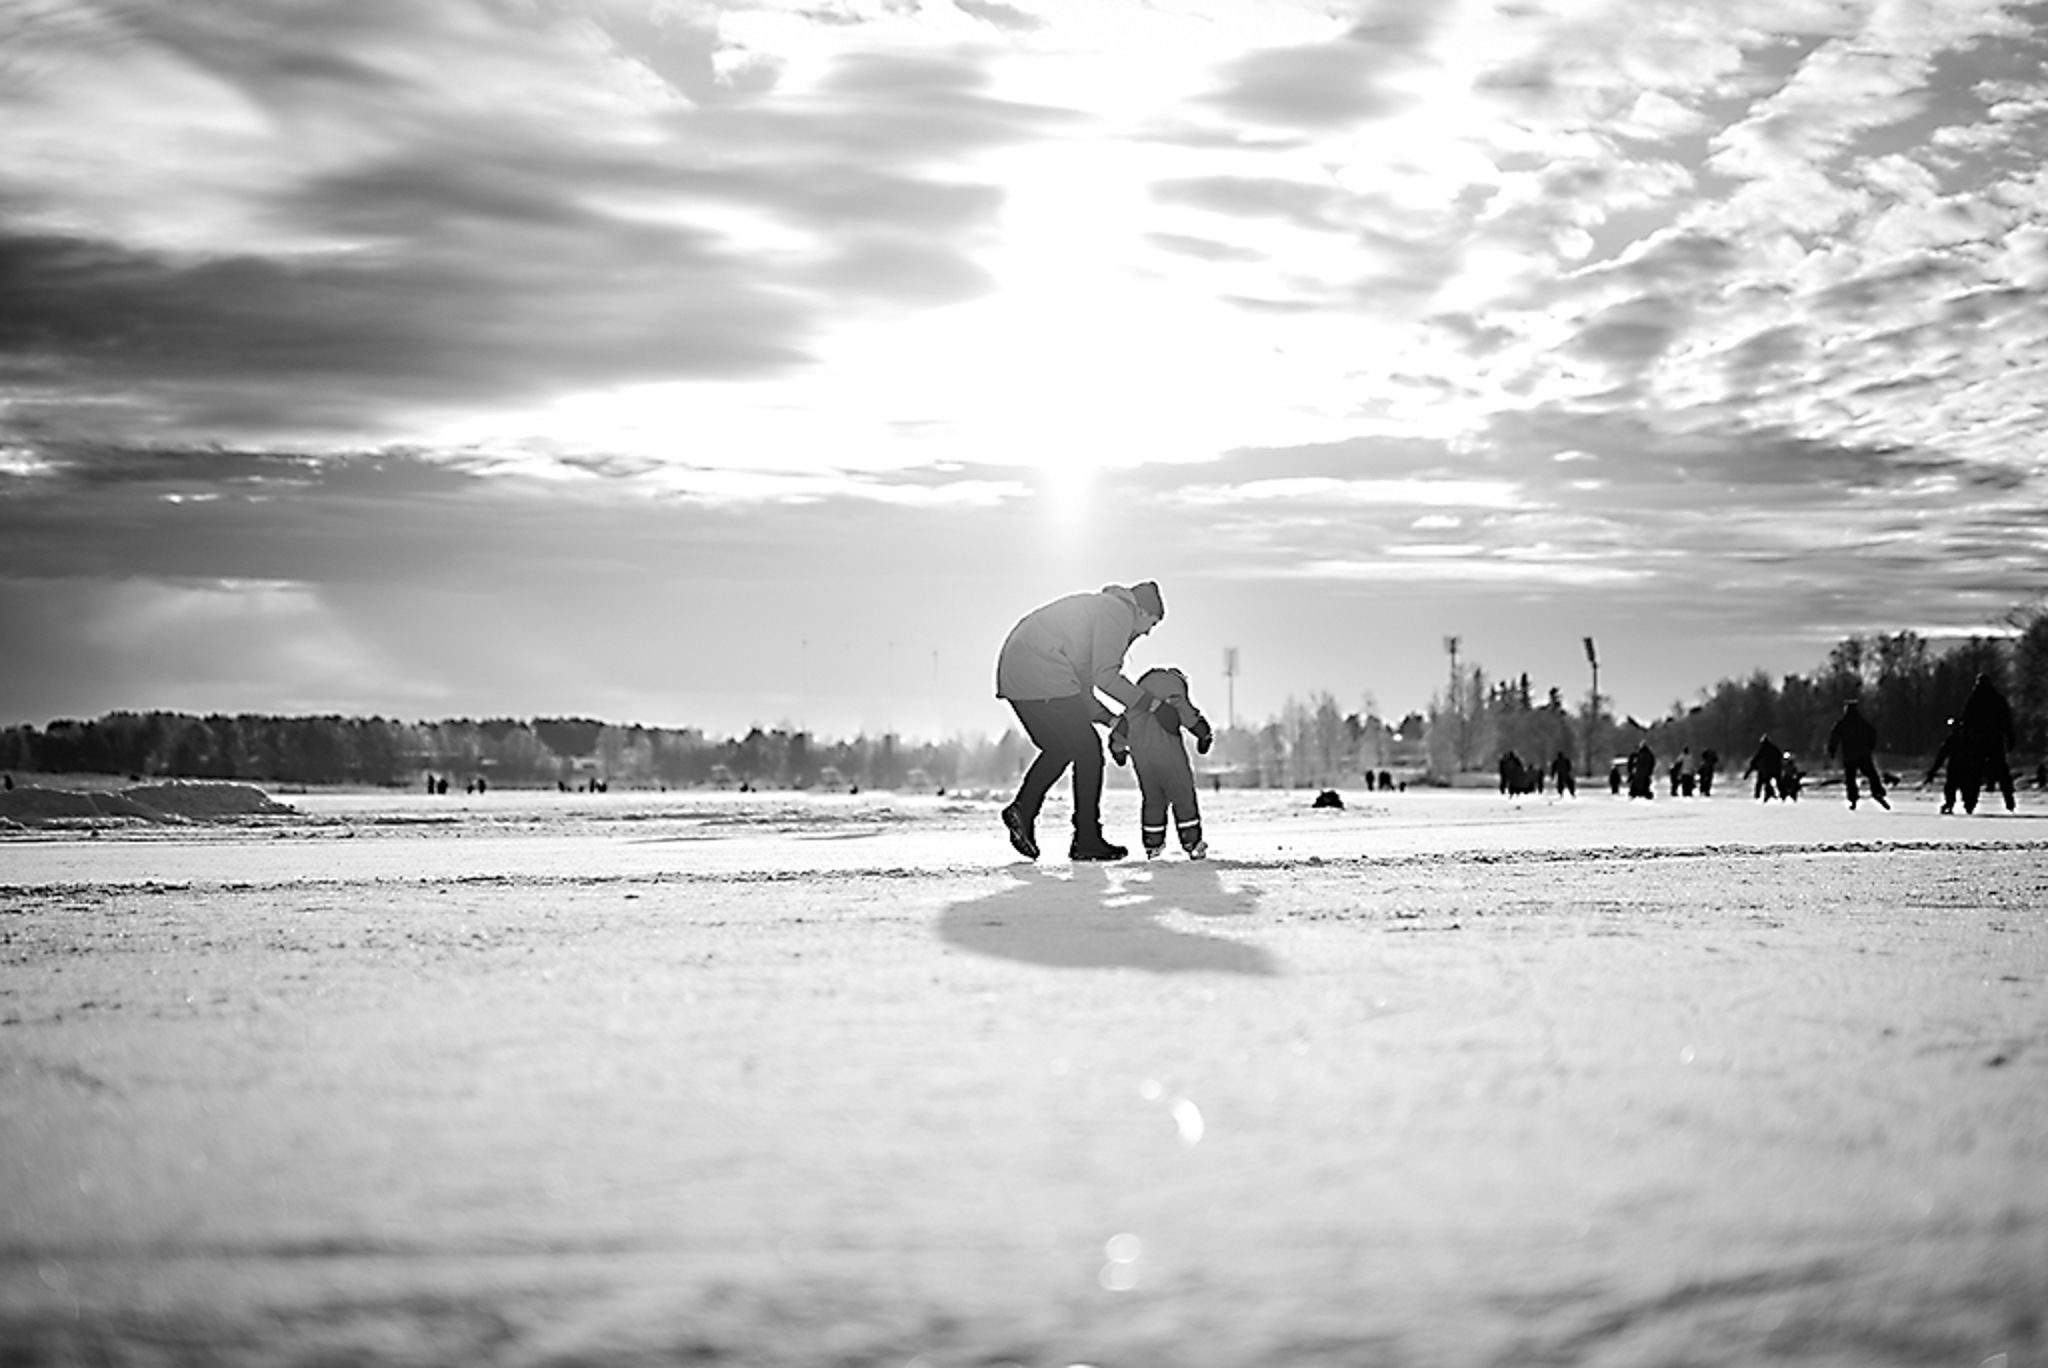 Man and child ice skating